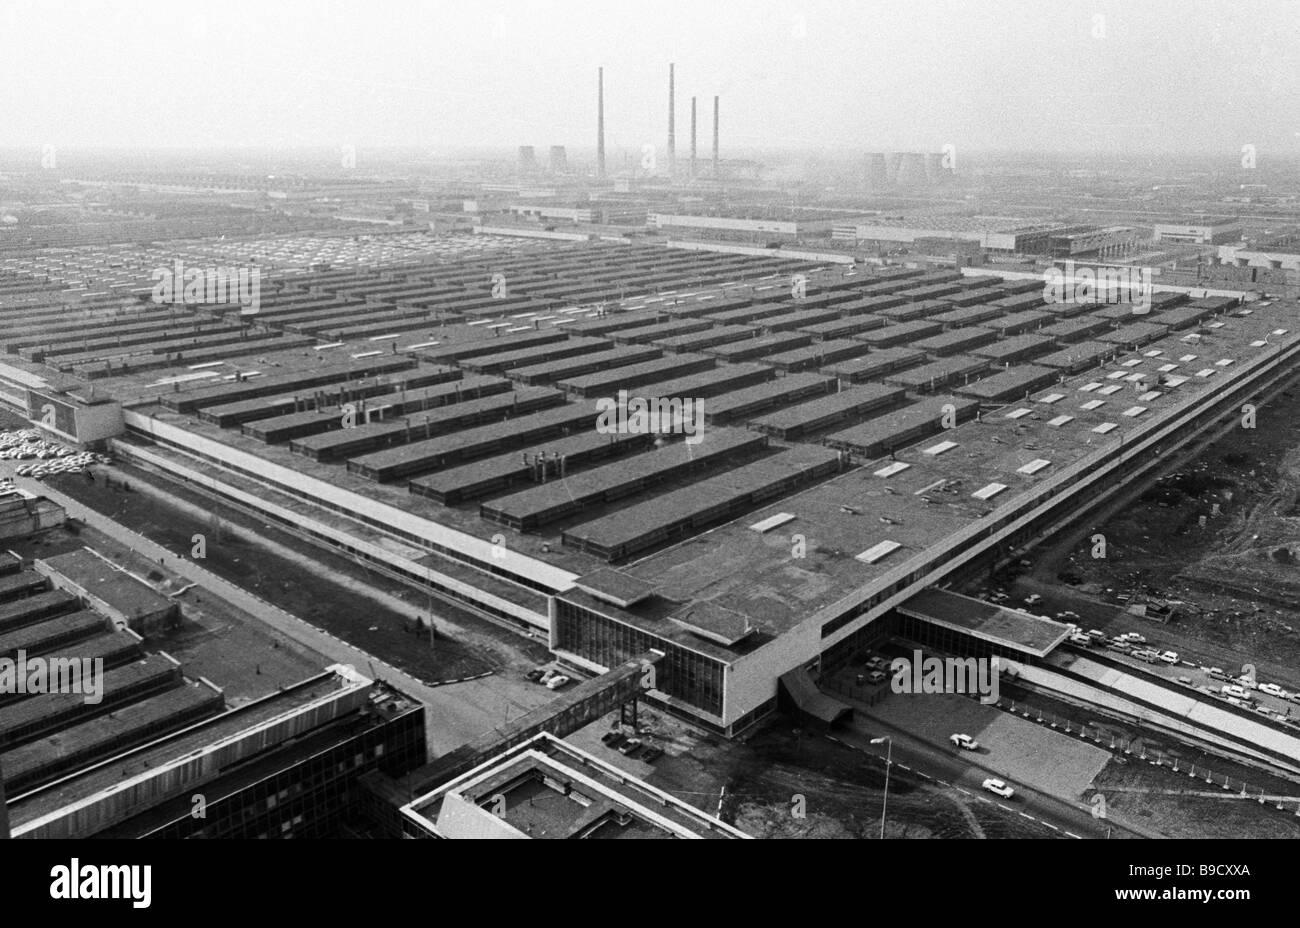 General view of Volga motor works - Stock Image